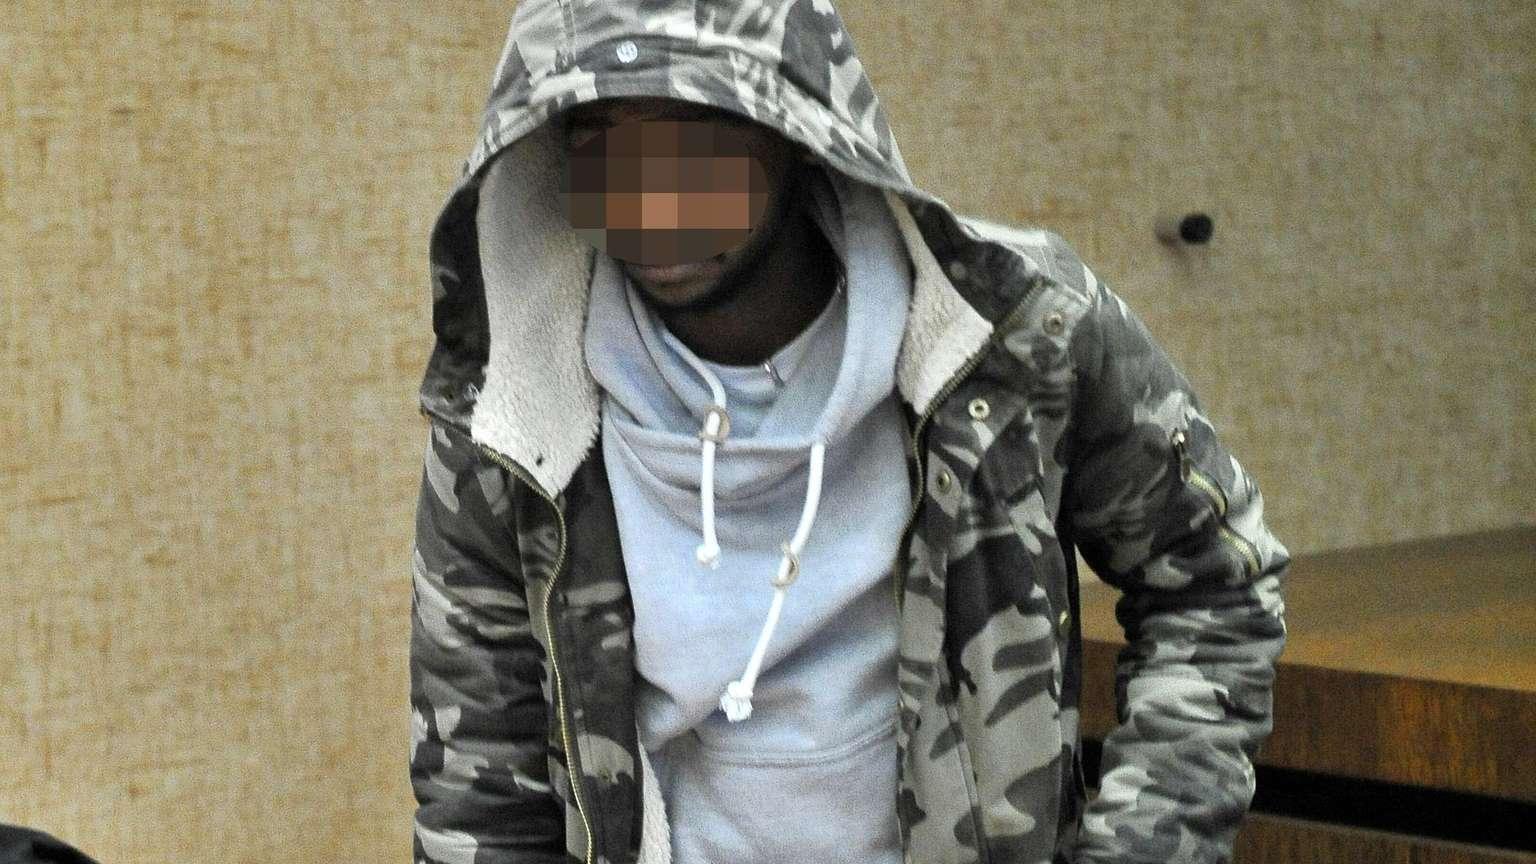 Übergriff im Flüchtlingsheim: Wurde Angela O. vergewaltigt?